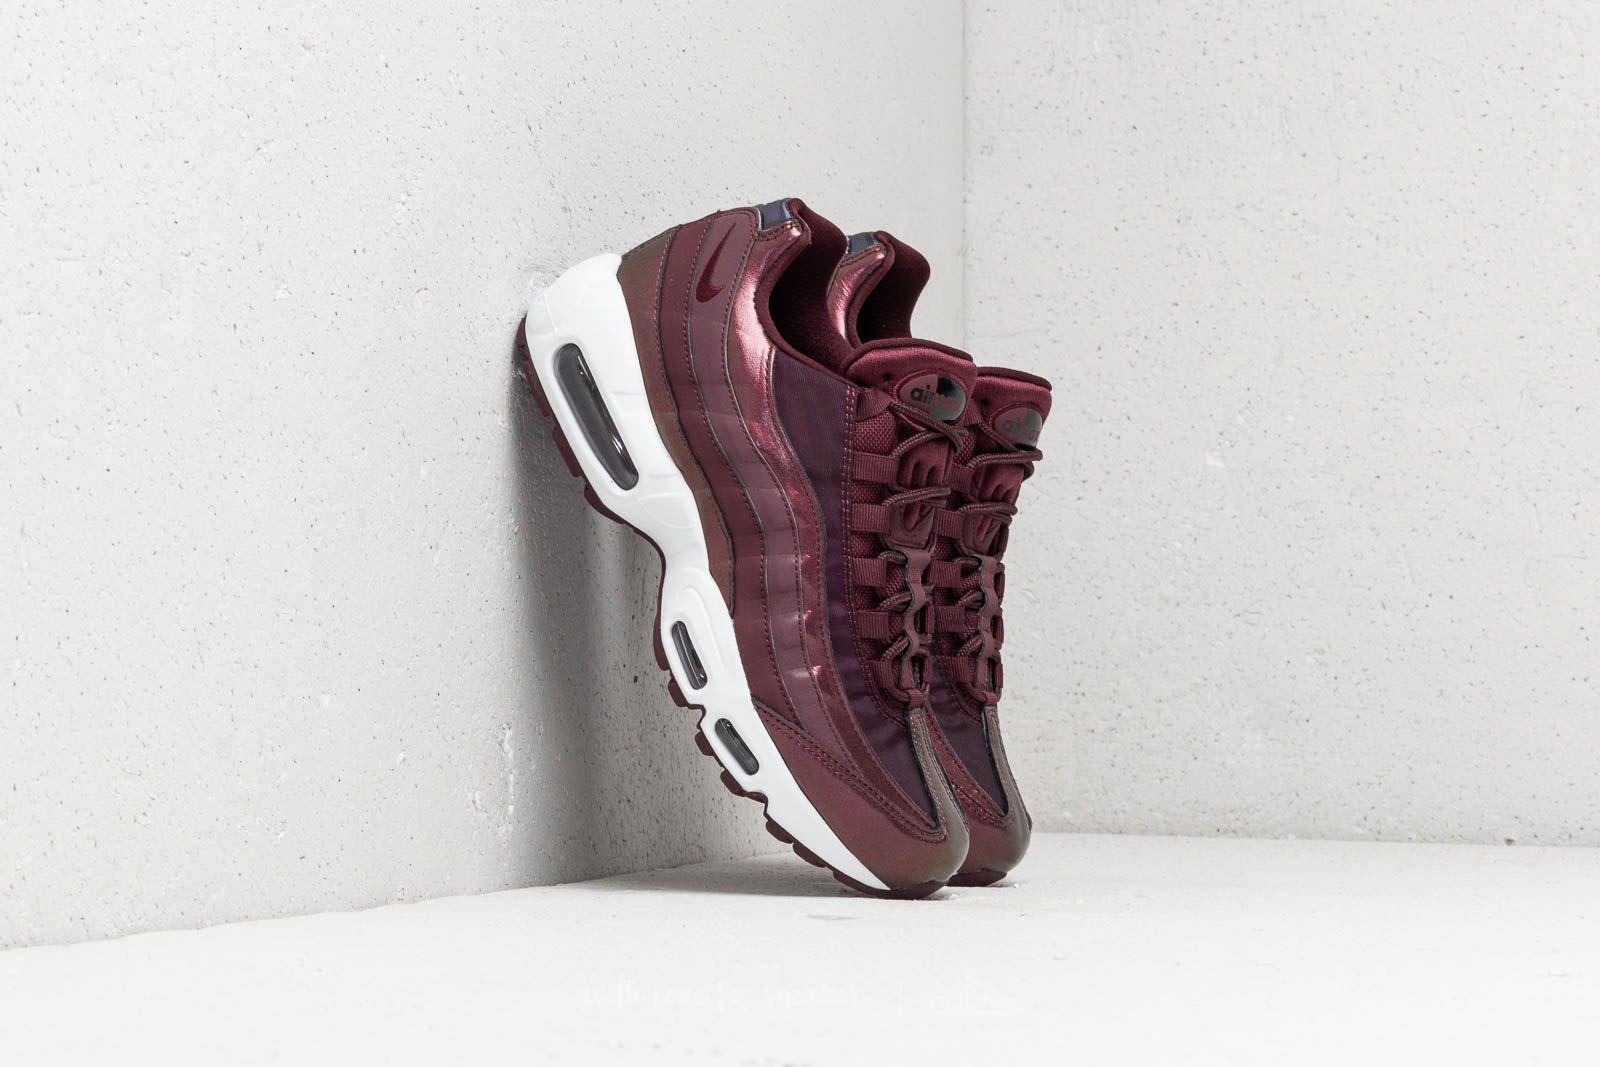 Dámské tenisky a boty Nike WMNS Air Max 95 SE Burgundy Crush/ Burgundy Crush